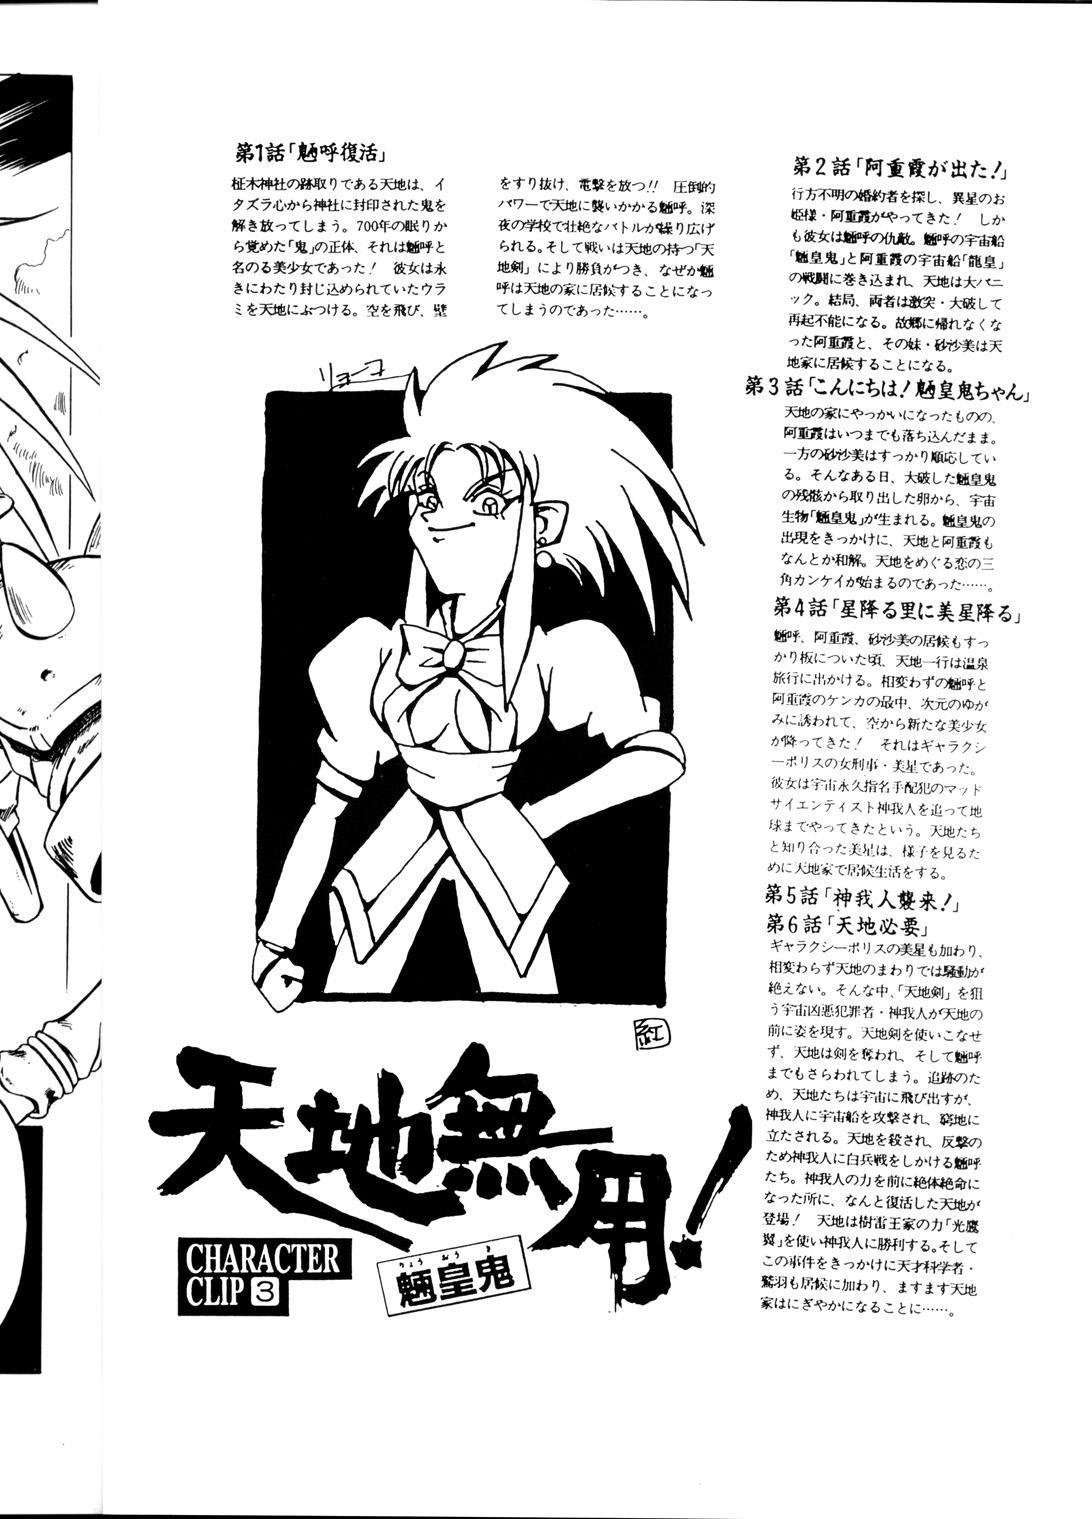 [B.B.C] Tenchi Muyou! Ryou-ou-ki Kaiteiben (Tenchi Muyou!) 6